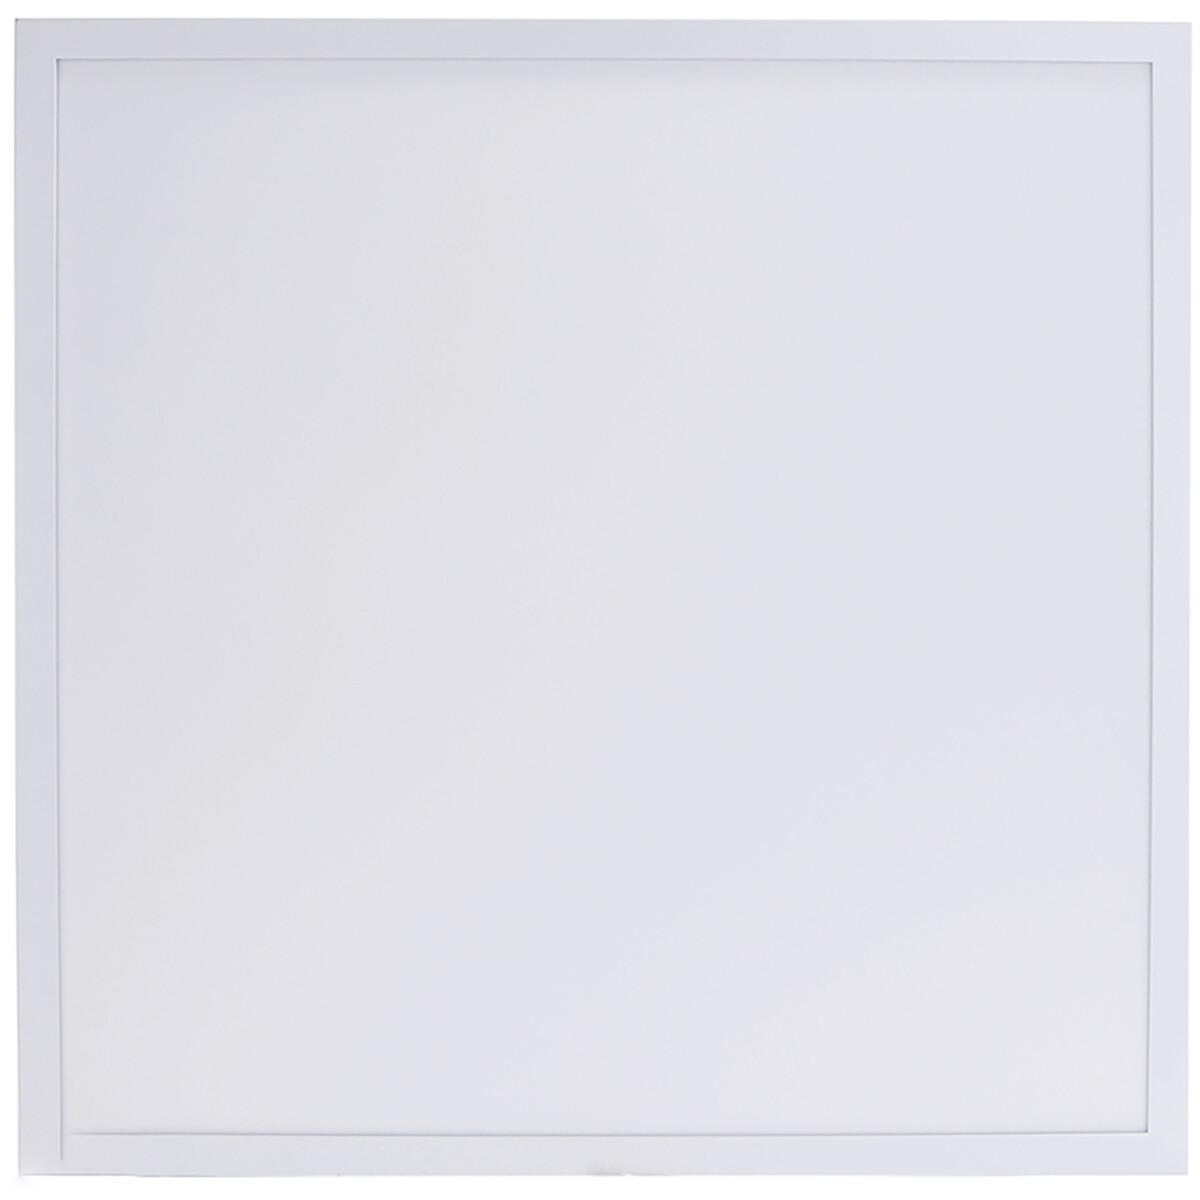 LED Paneel - Aigi Hyron - 60x60 - Aanpasbare Kleur CCT - 32W - Inbouw - Vierkant - Mat Wit - Aluminium - Flikkervrij